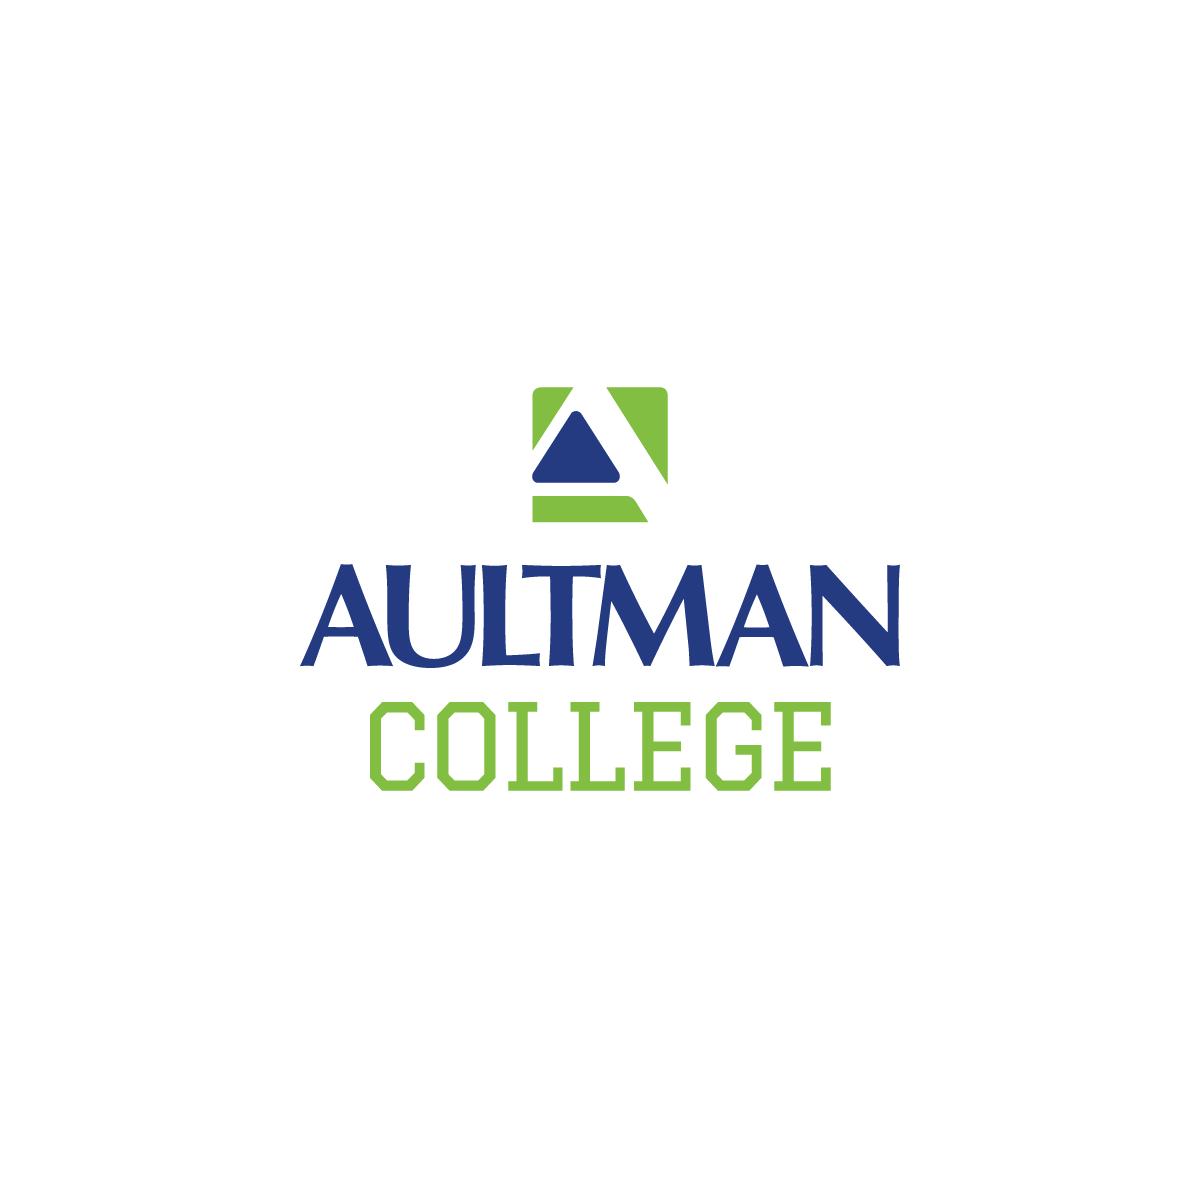 Aultman College - Student Billing Specialist